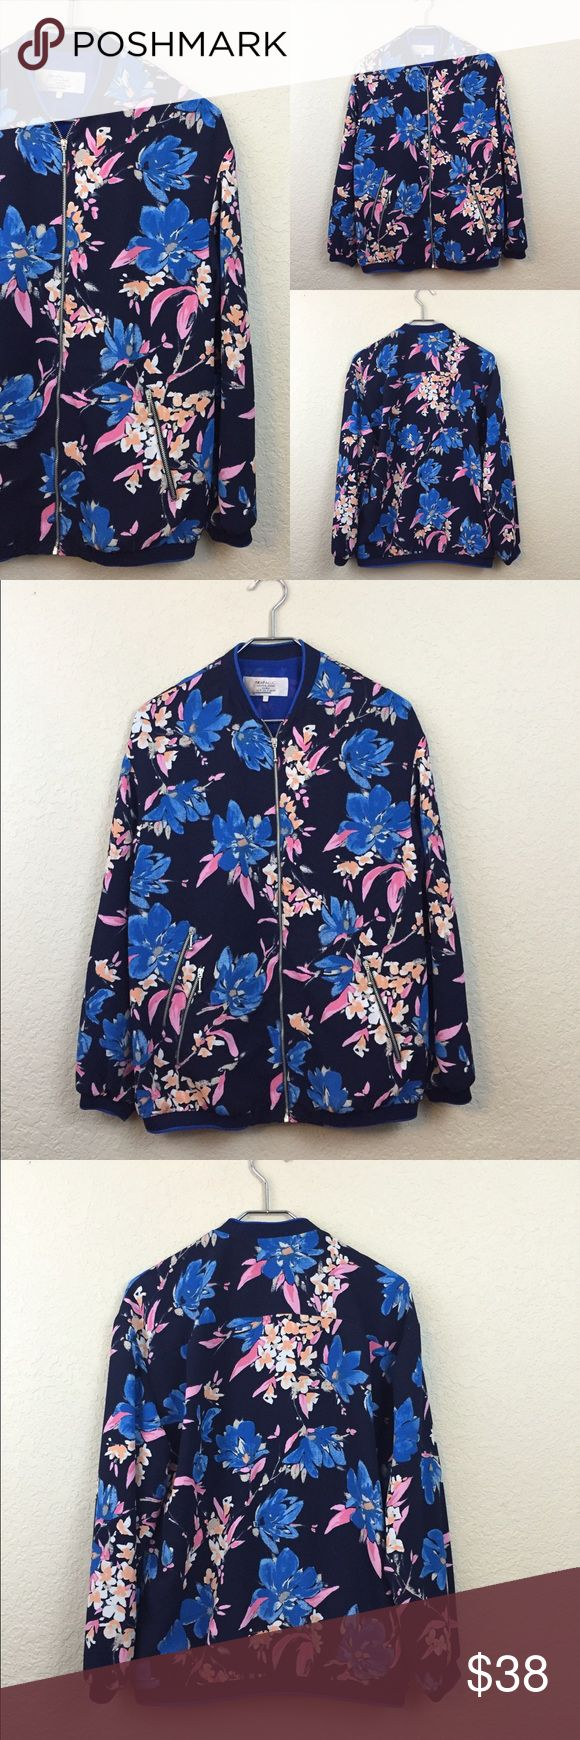 "New Zara floral bomber jacket • Zara • Jacket light weight •  new  • Size Small • polyester • Pit to pit 19"" Zara Jackets & Coats"